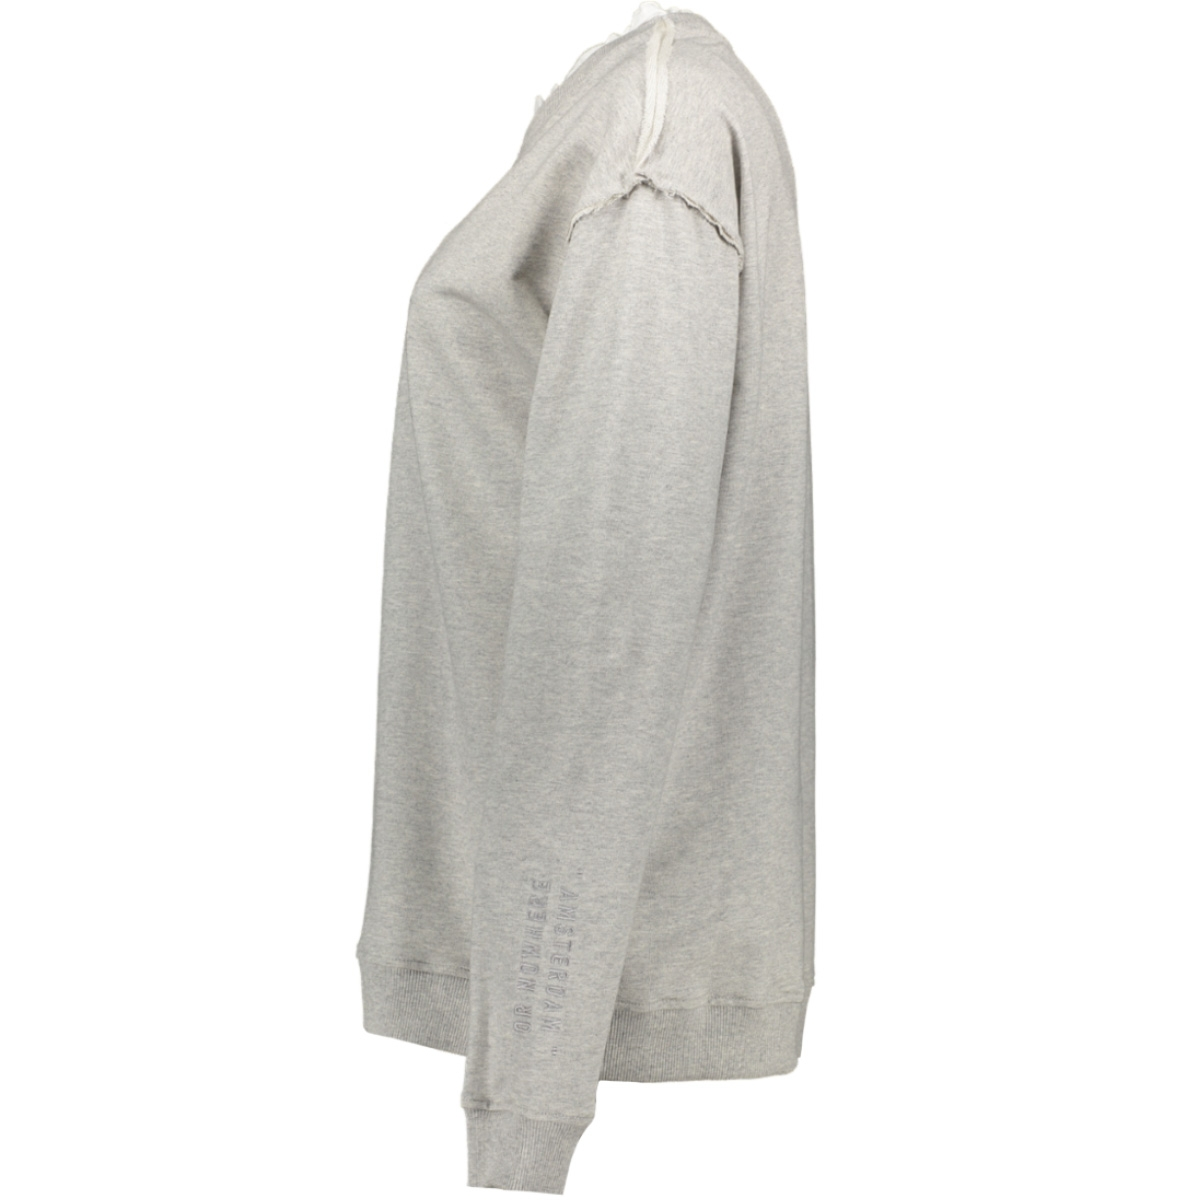 sweater ruffles 20 818 8103 10 days sweater light grey melee